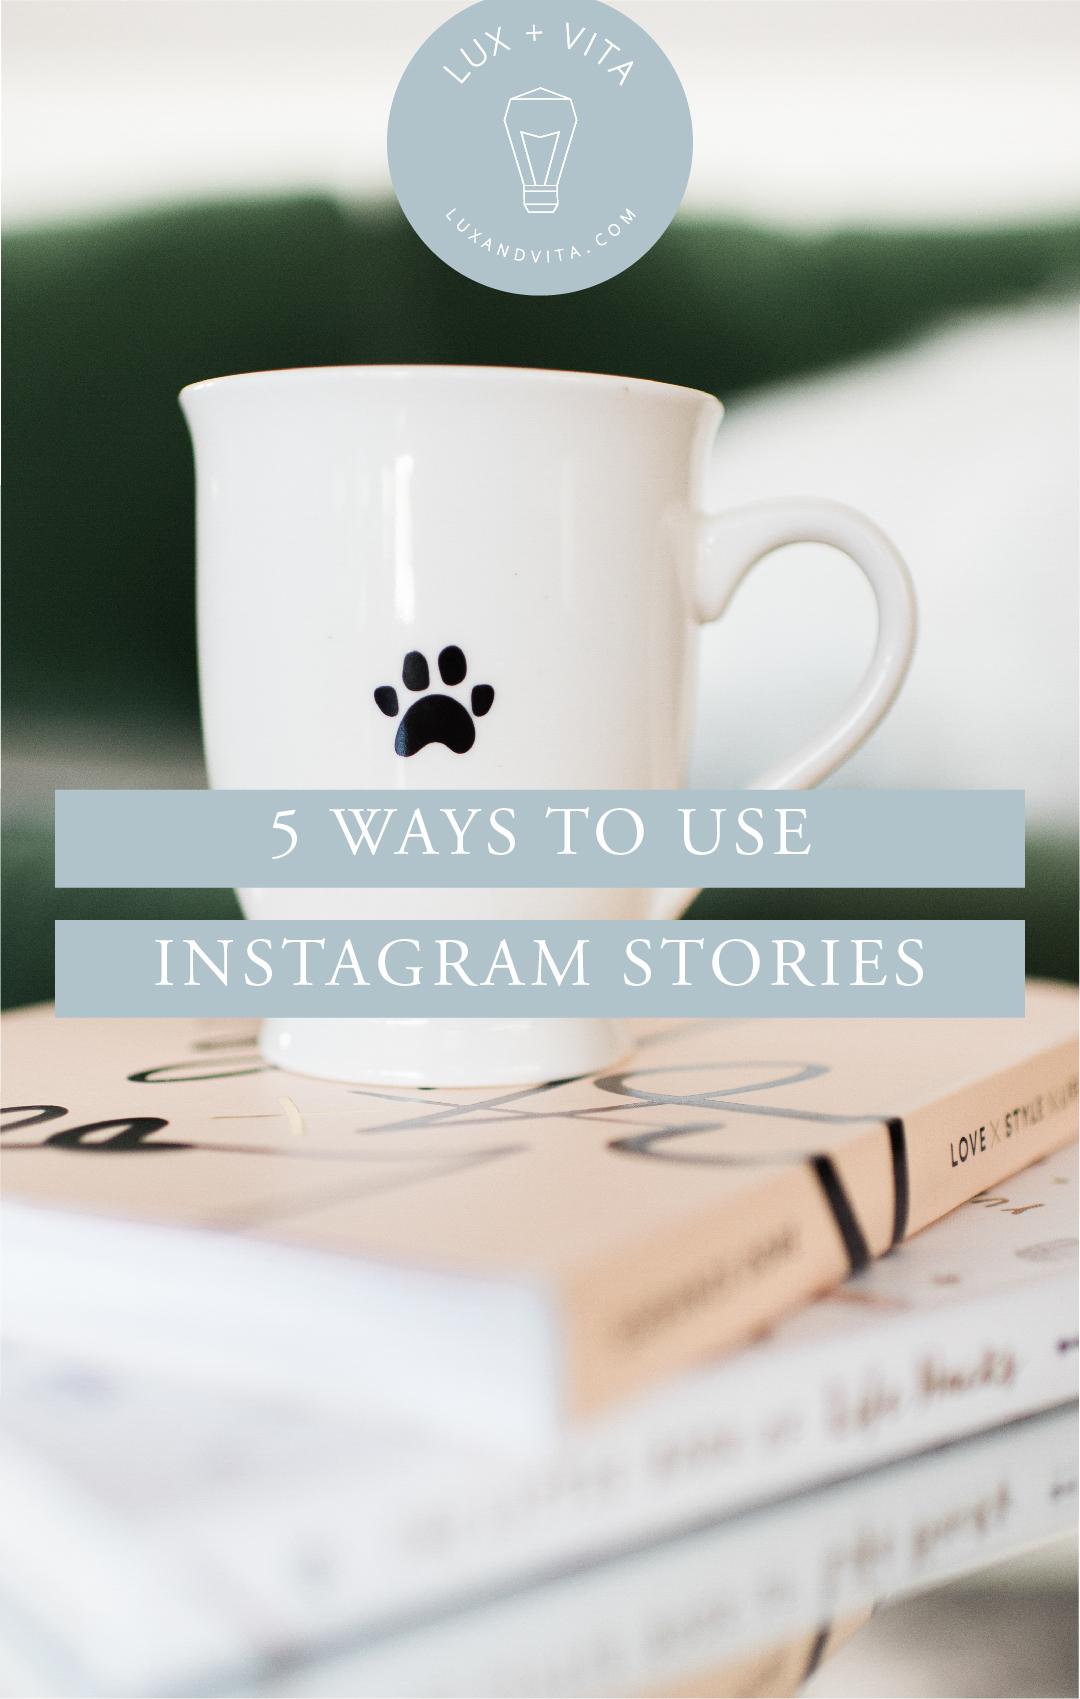 Blog-ways-to-use-instagram-stories_Pinterest-Tall.jpg